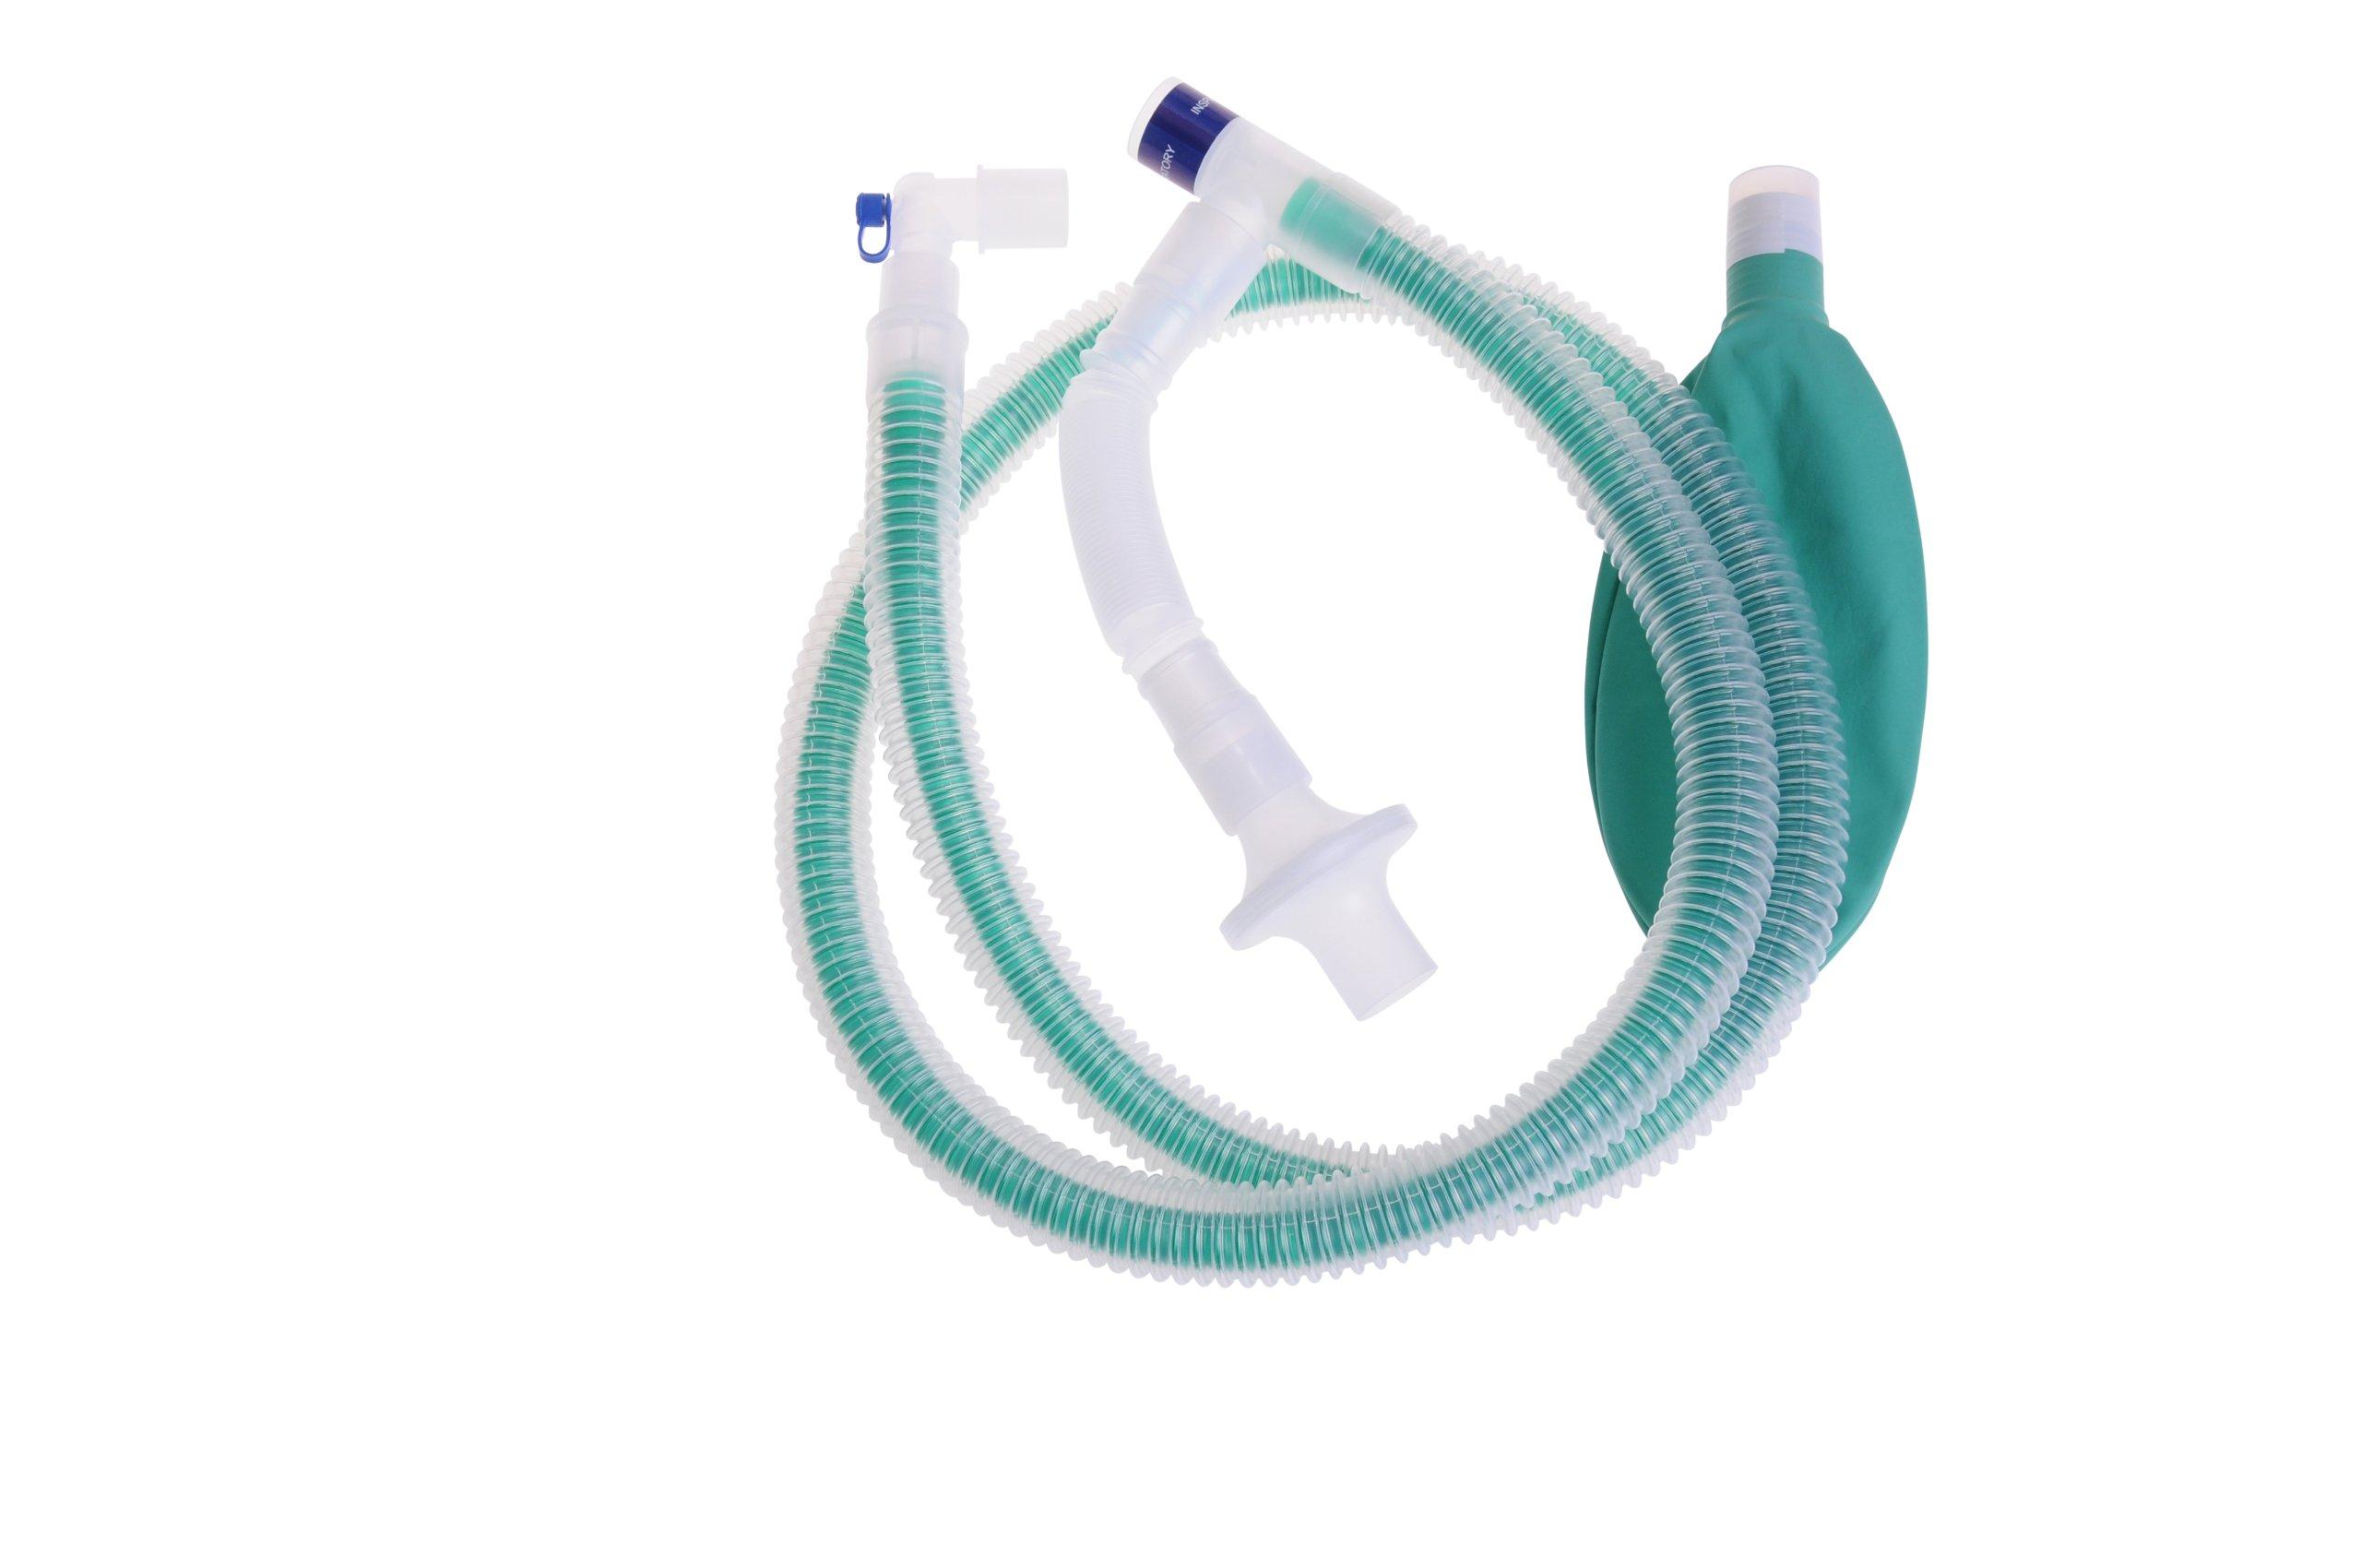 Medline DYNJAPF4000A Pediatric 40'' Unilimb Anesthesia Circuit w/Gas Sampling Line (Case of 20)